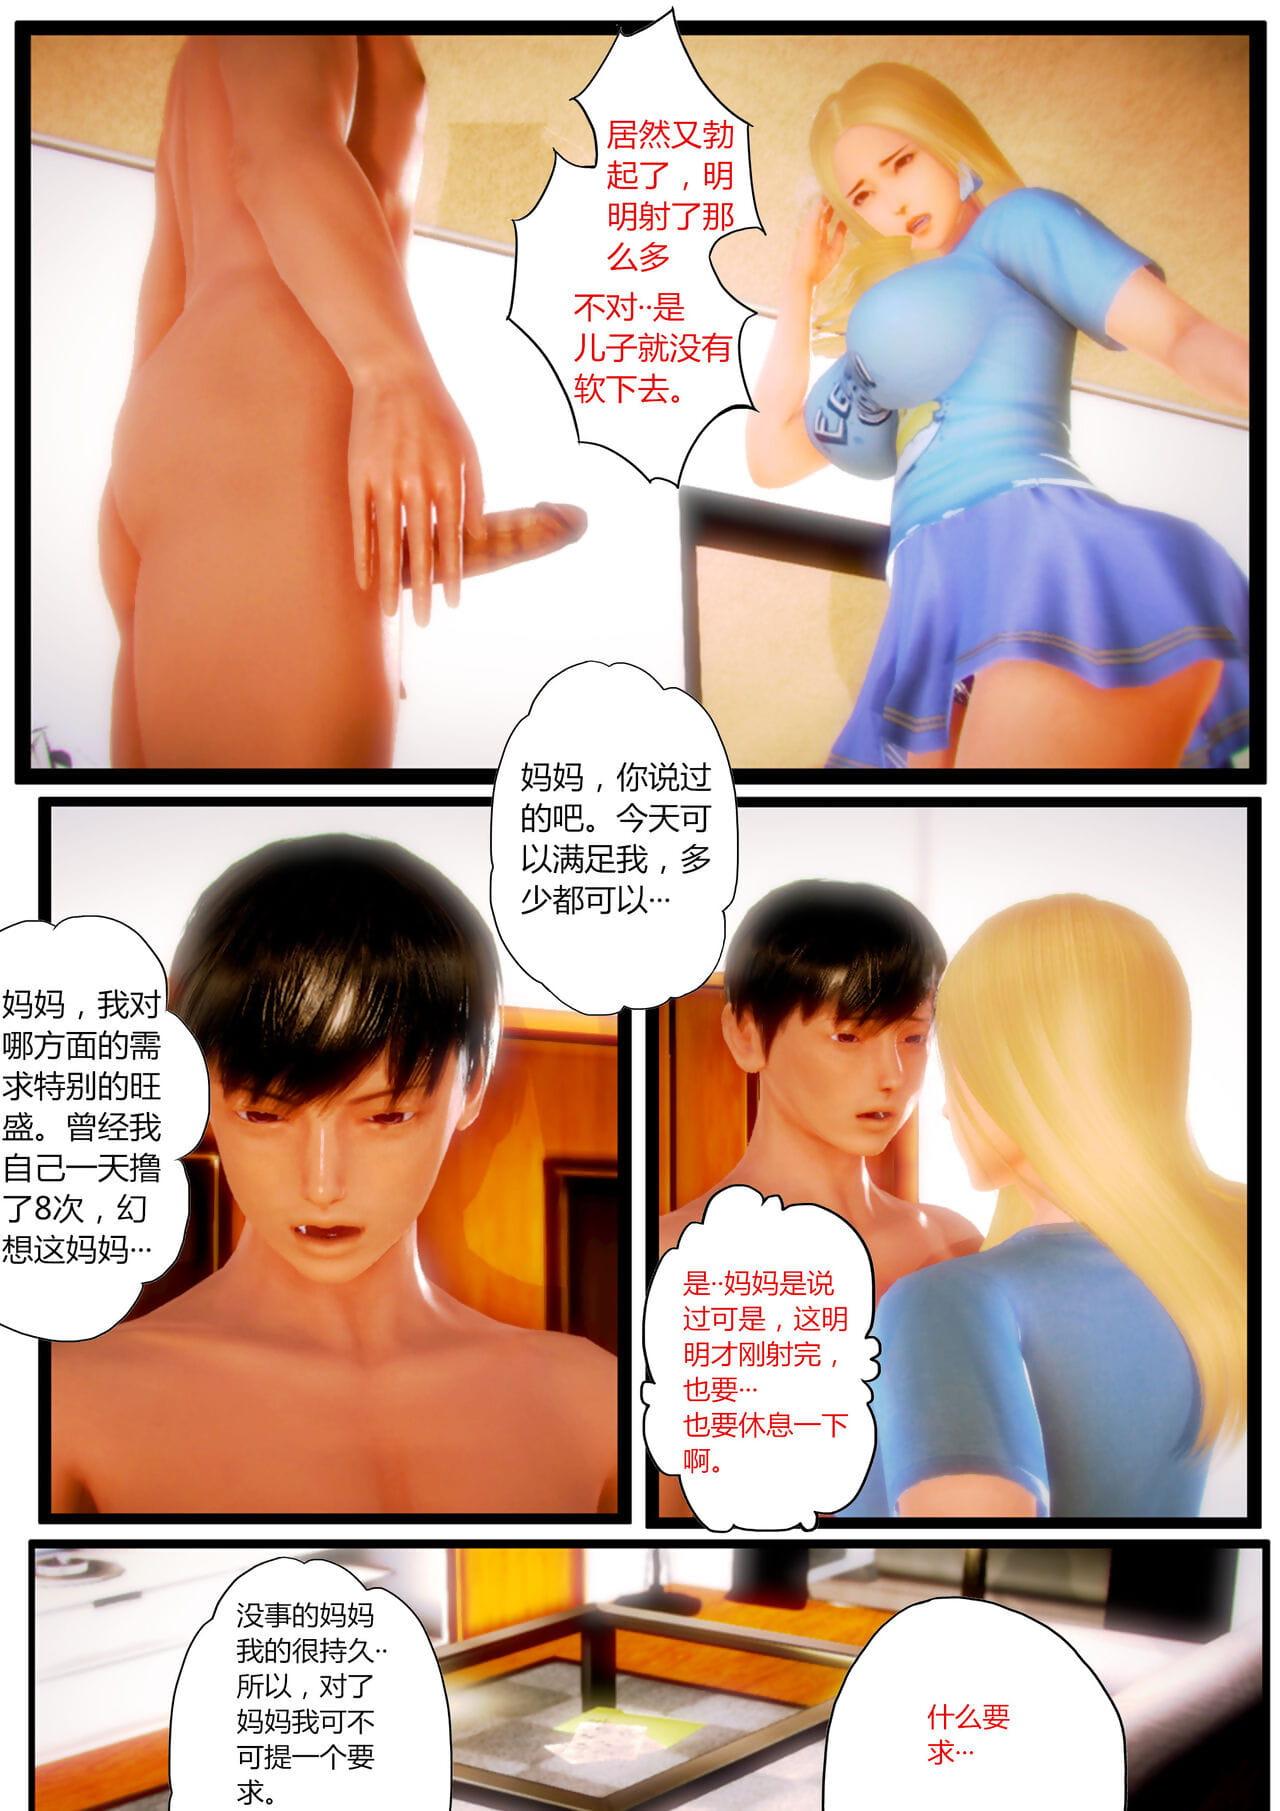 AA Daimaou 我的妈妈是妖狐(已经弃坑) Chinese - accouterment 4